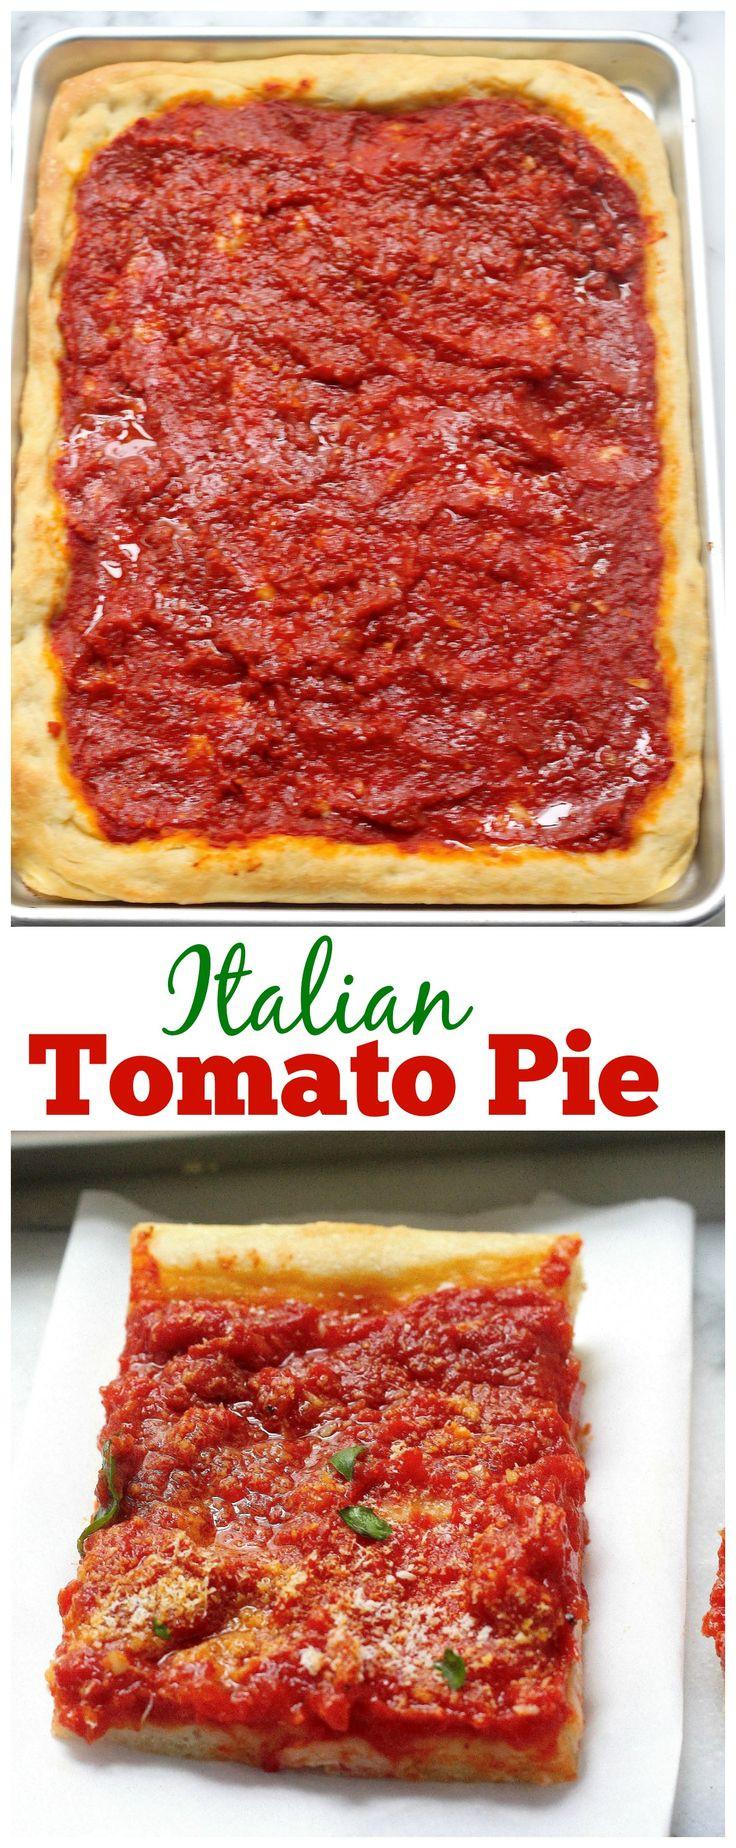 Utica Tomato Pie  Tomato Pie